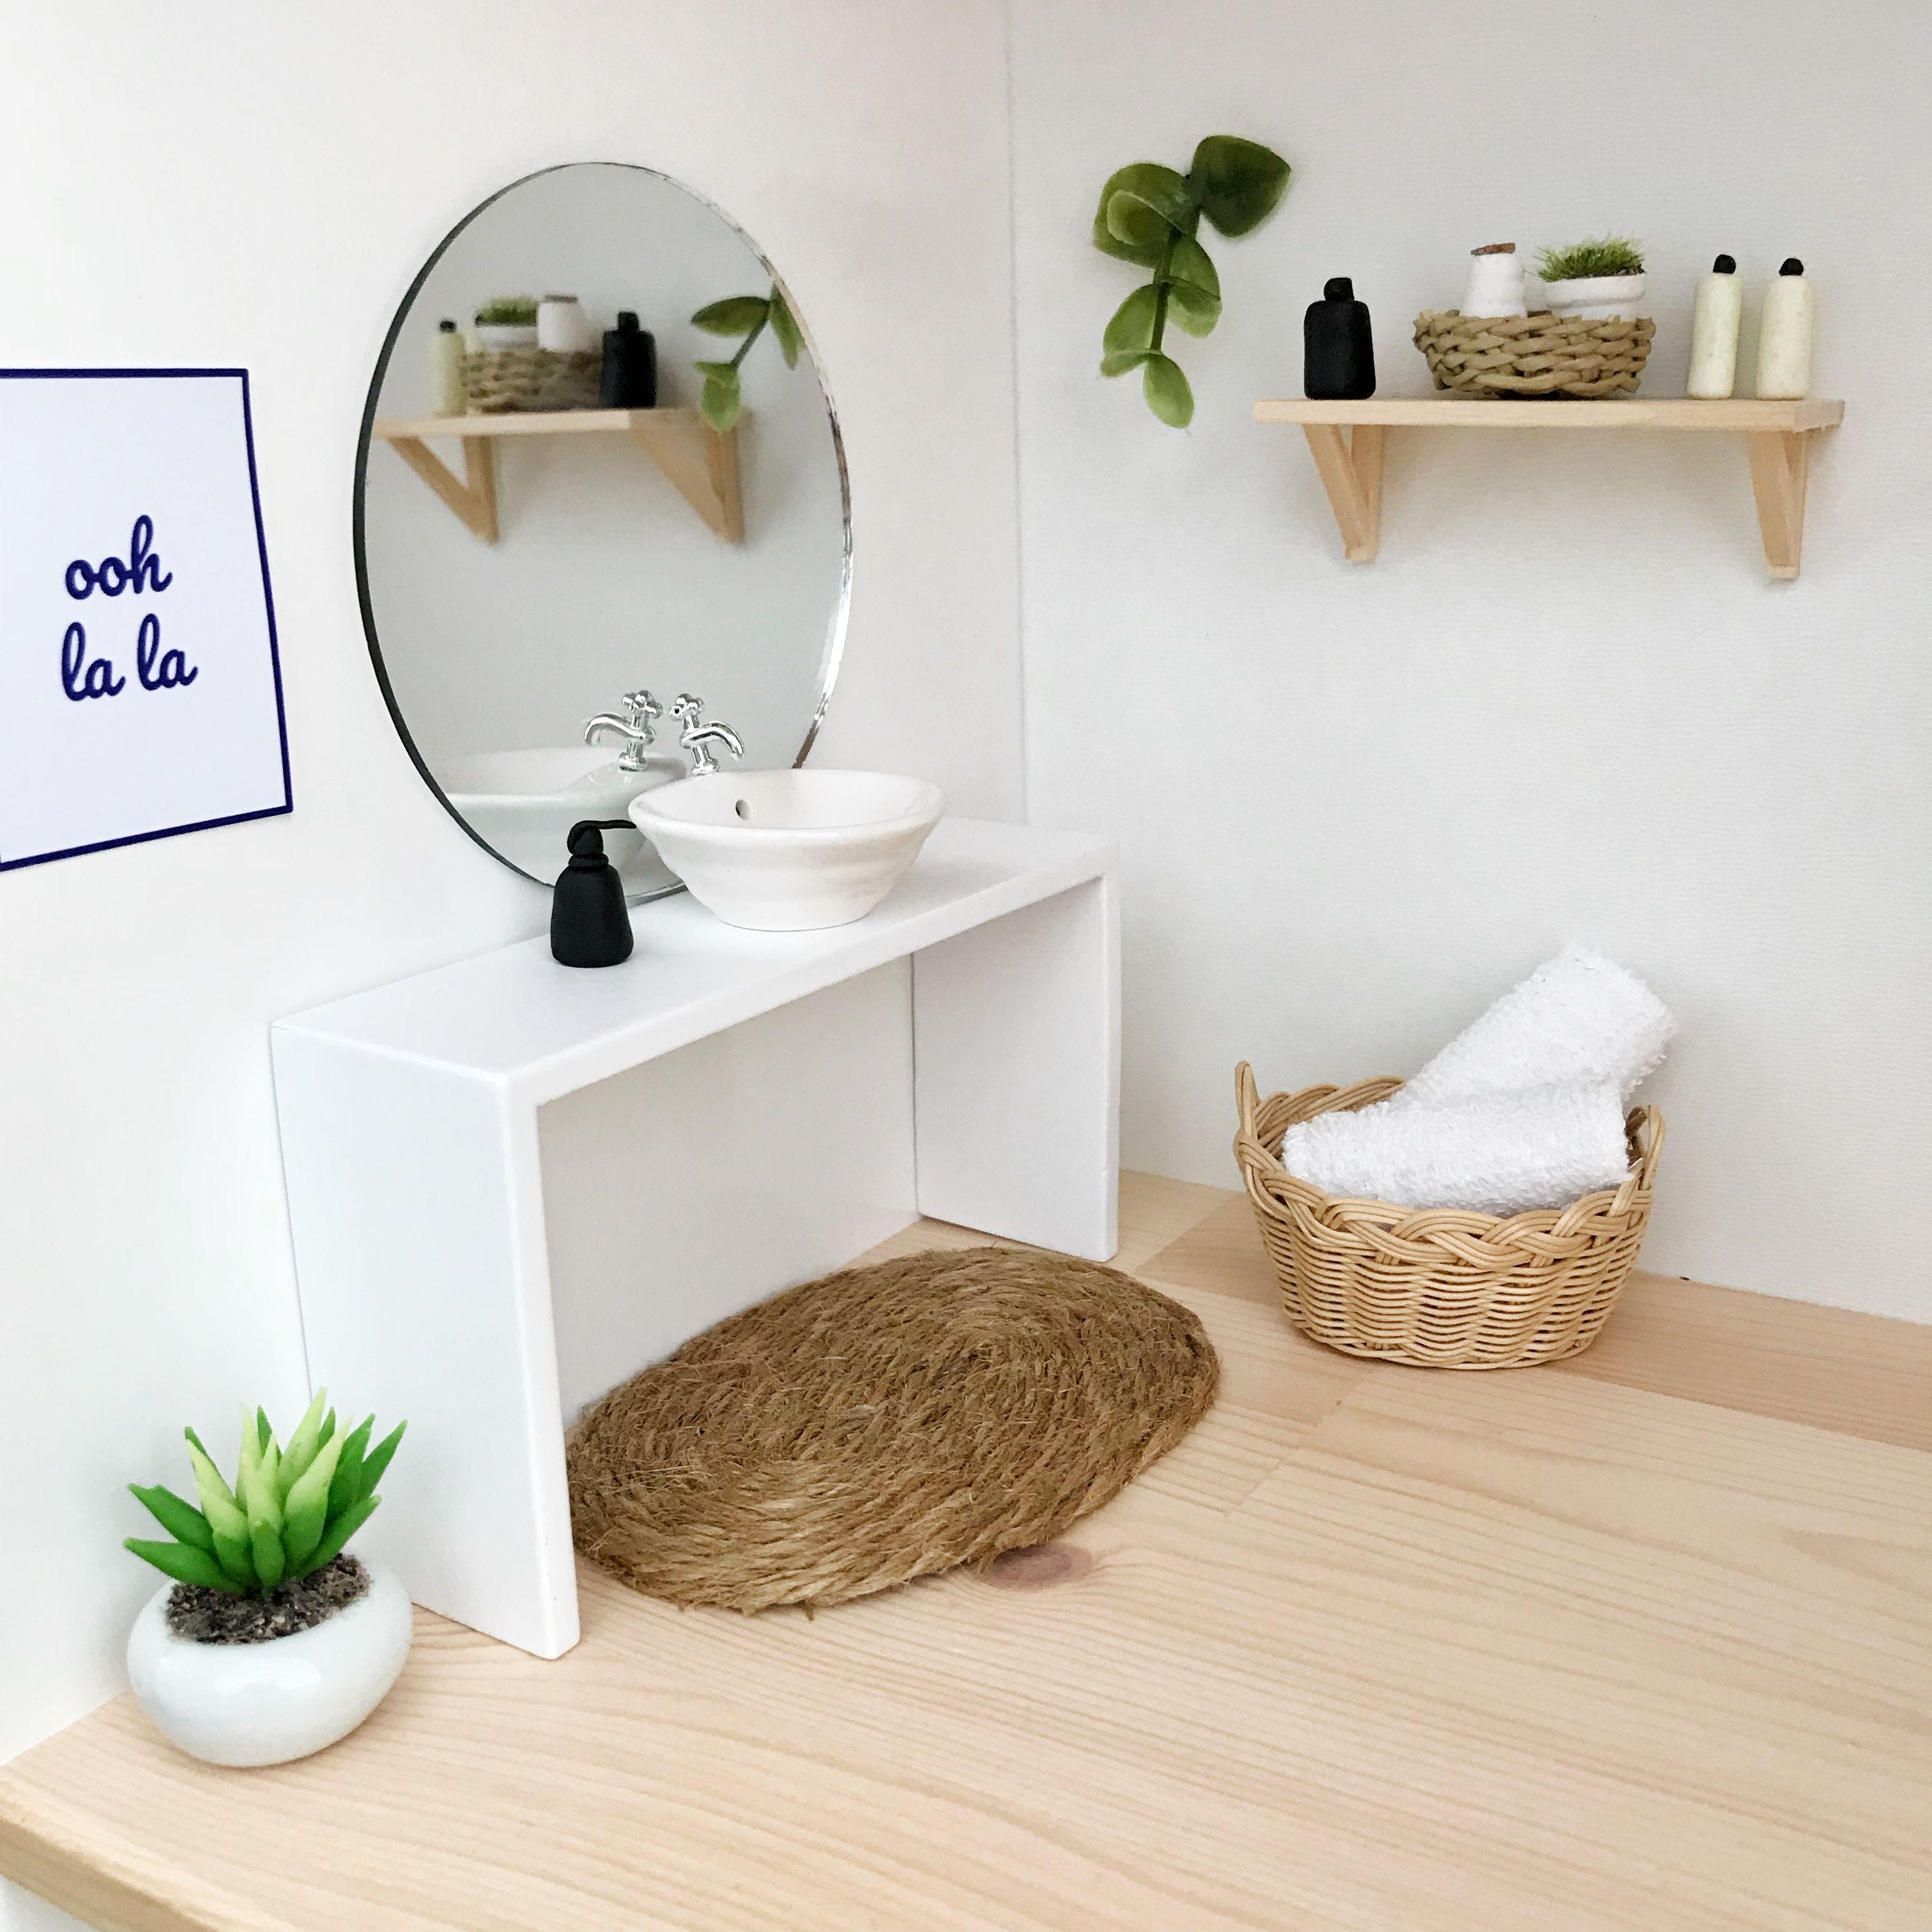 Pretty Little Minis - modern dollhouse furniture and decor for sale #dollhousefurniture